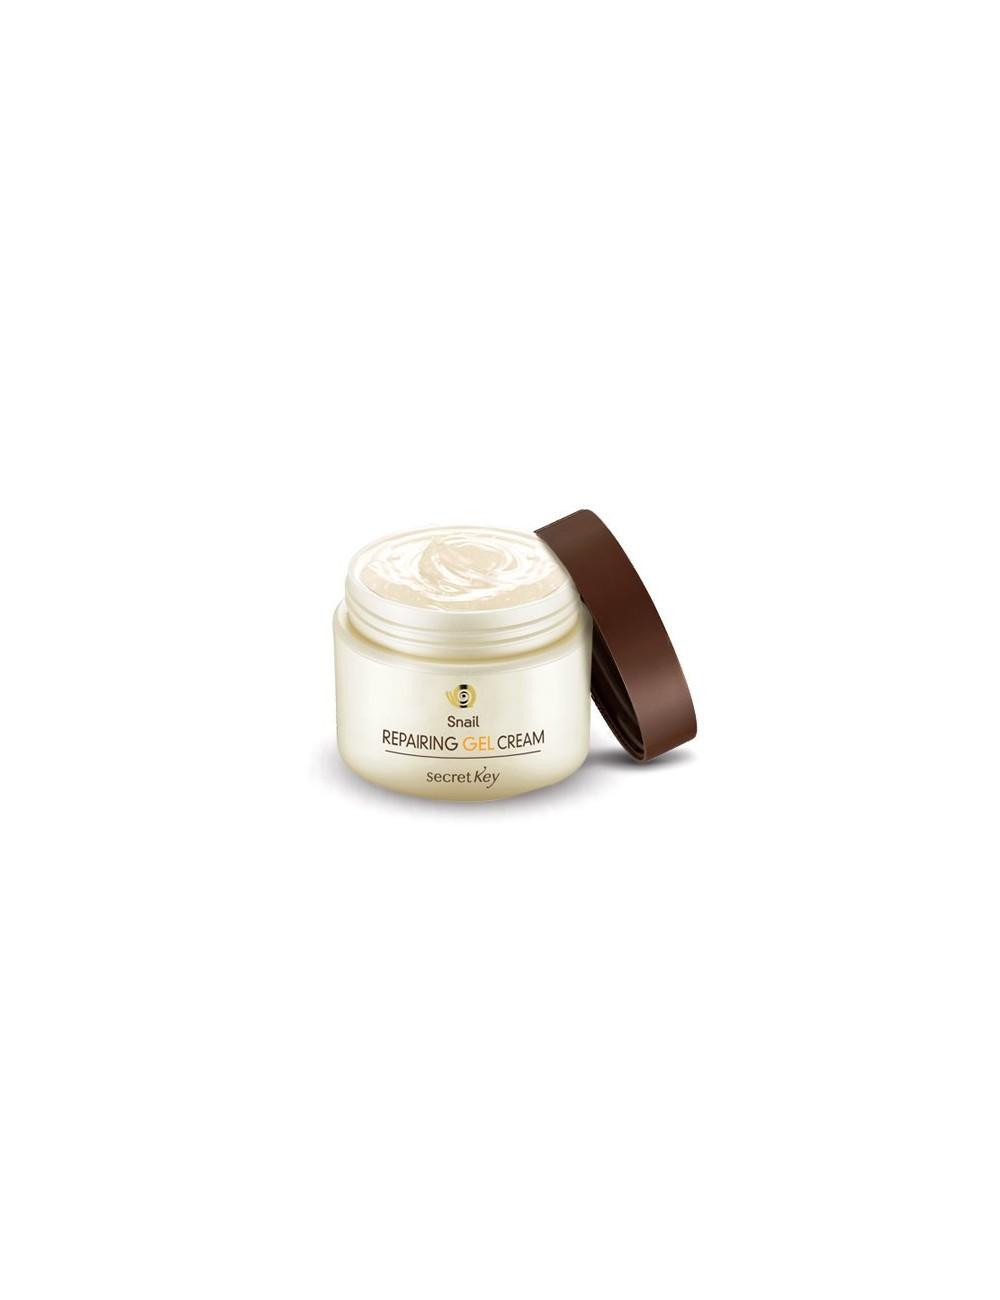 Crema Hidratante y Regenerante Secret Key Snail Reparing Gel Cream